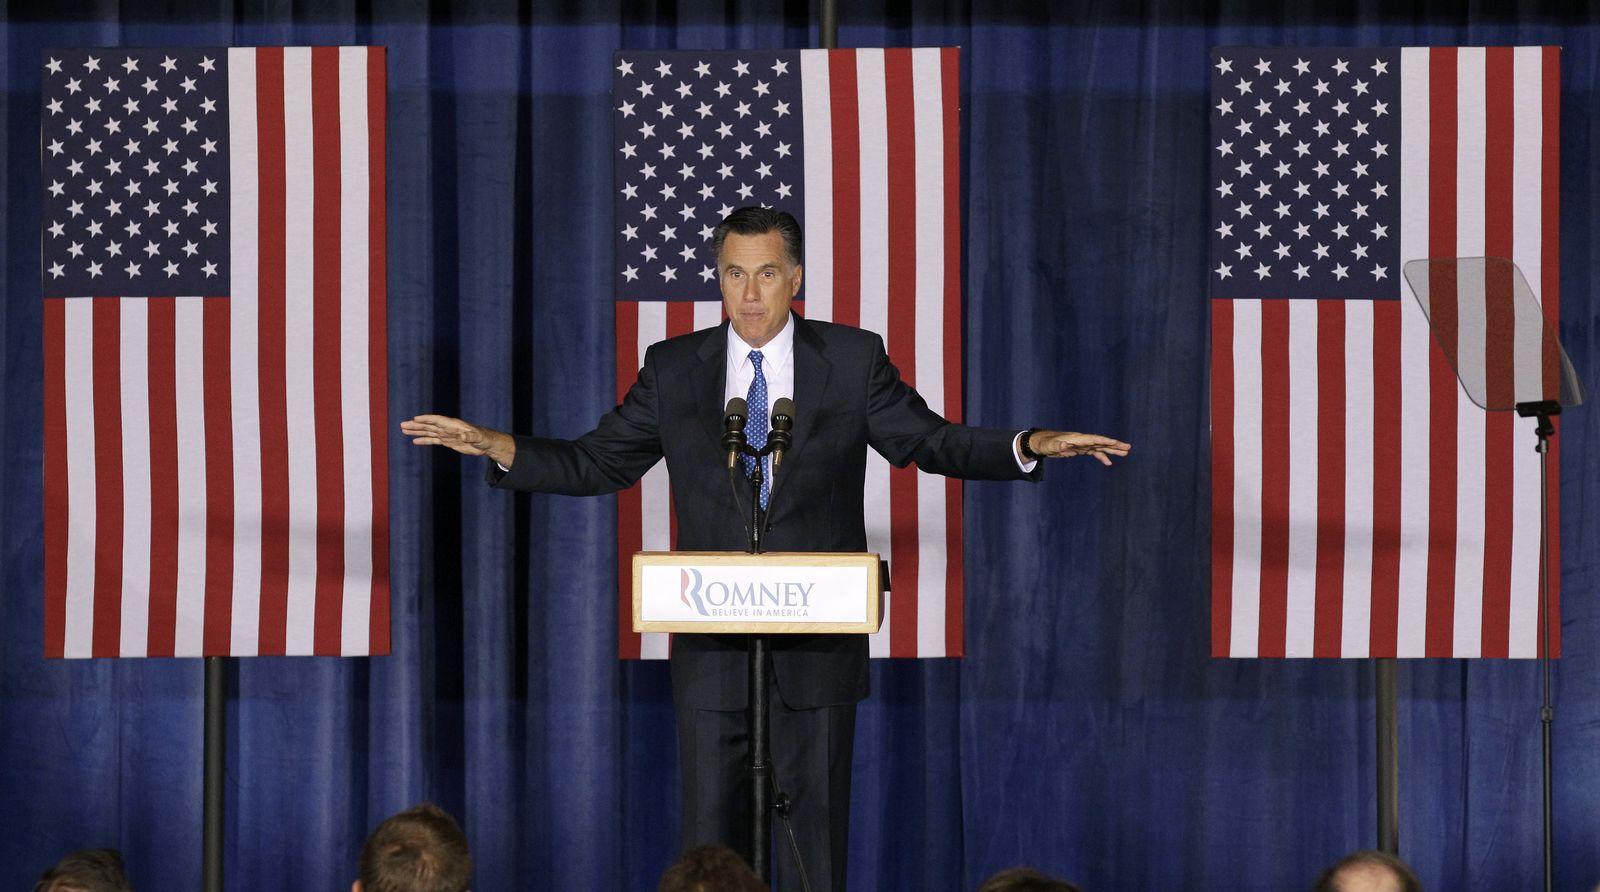 Romney Fact Check